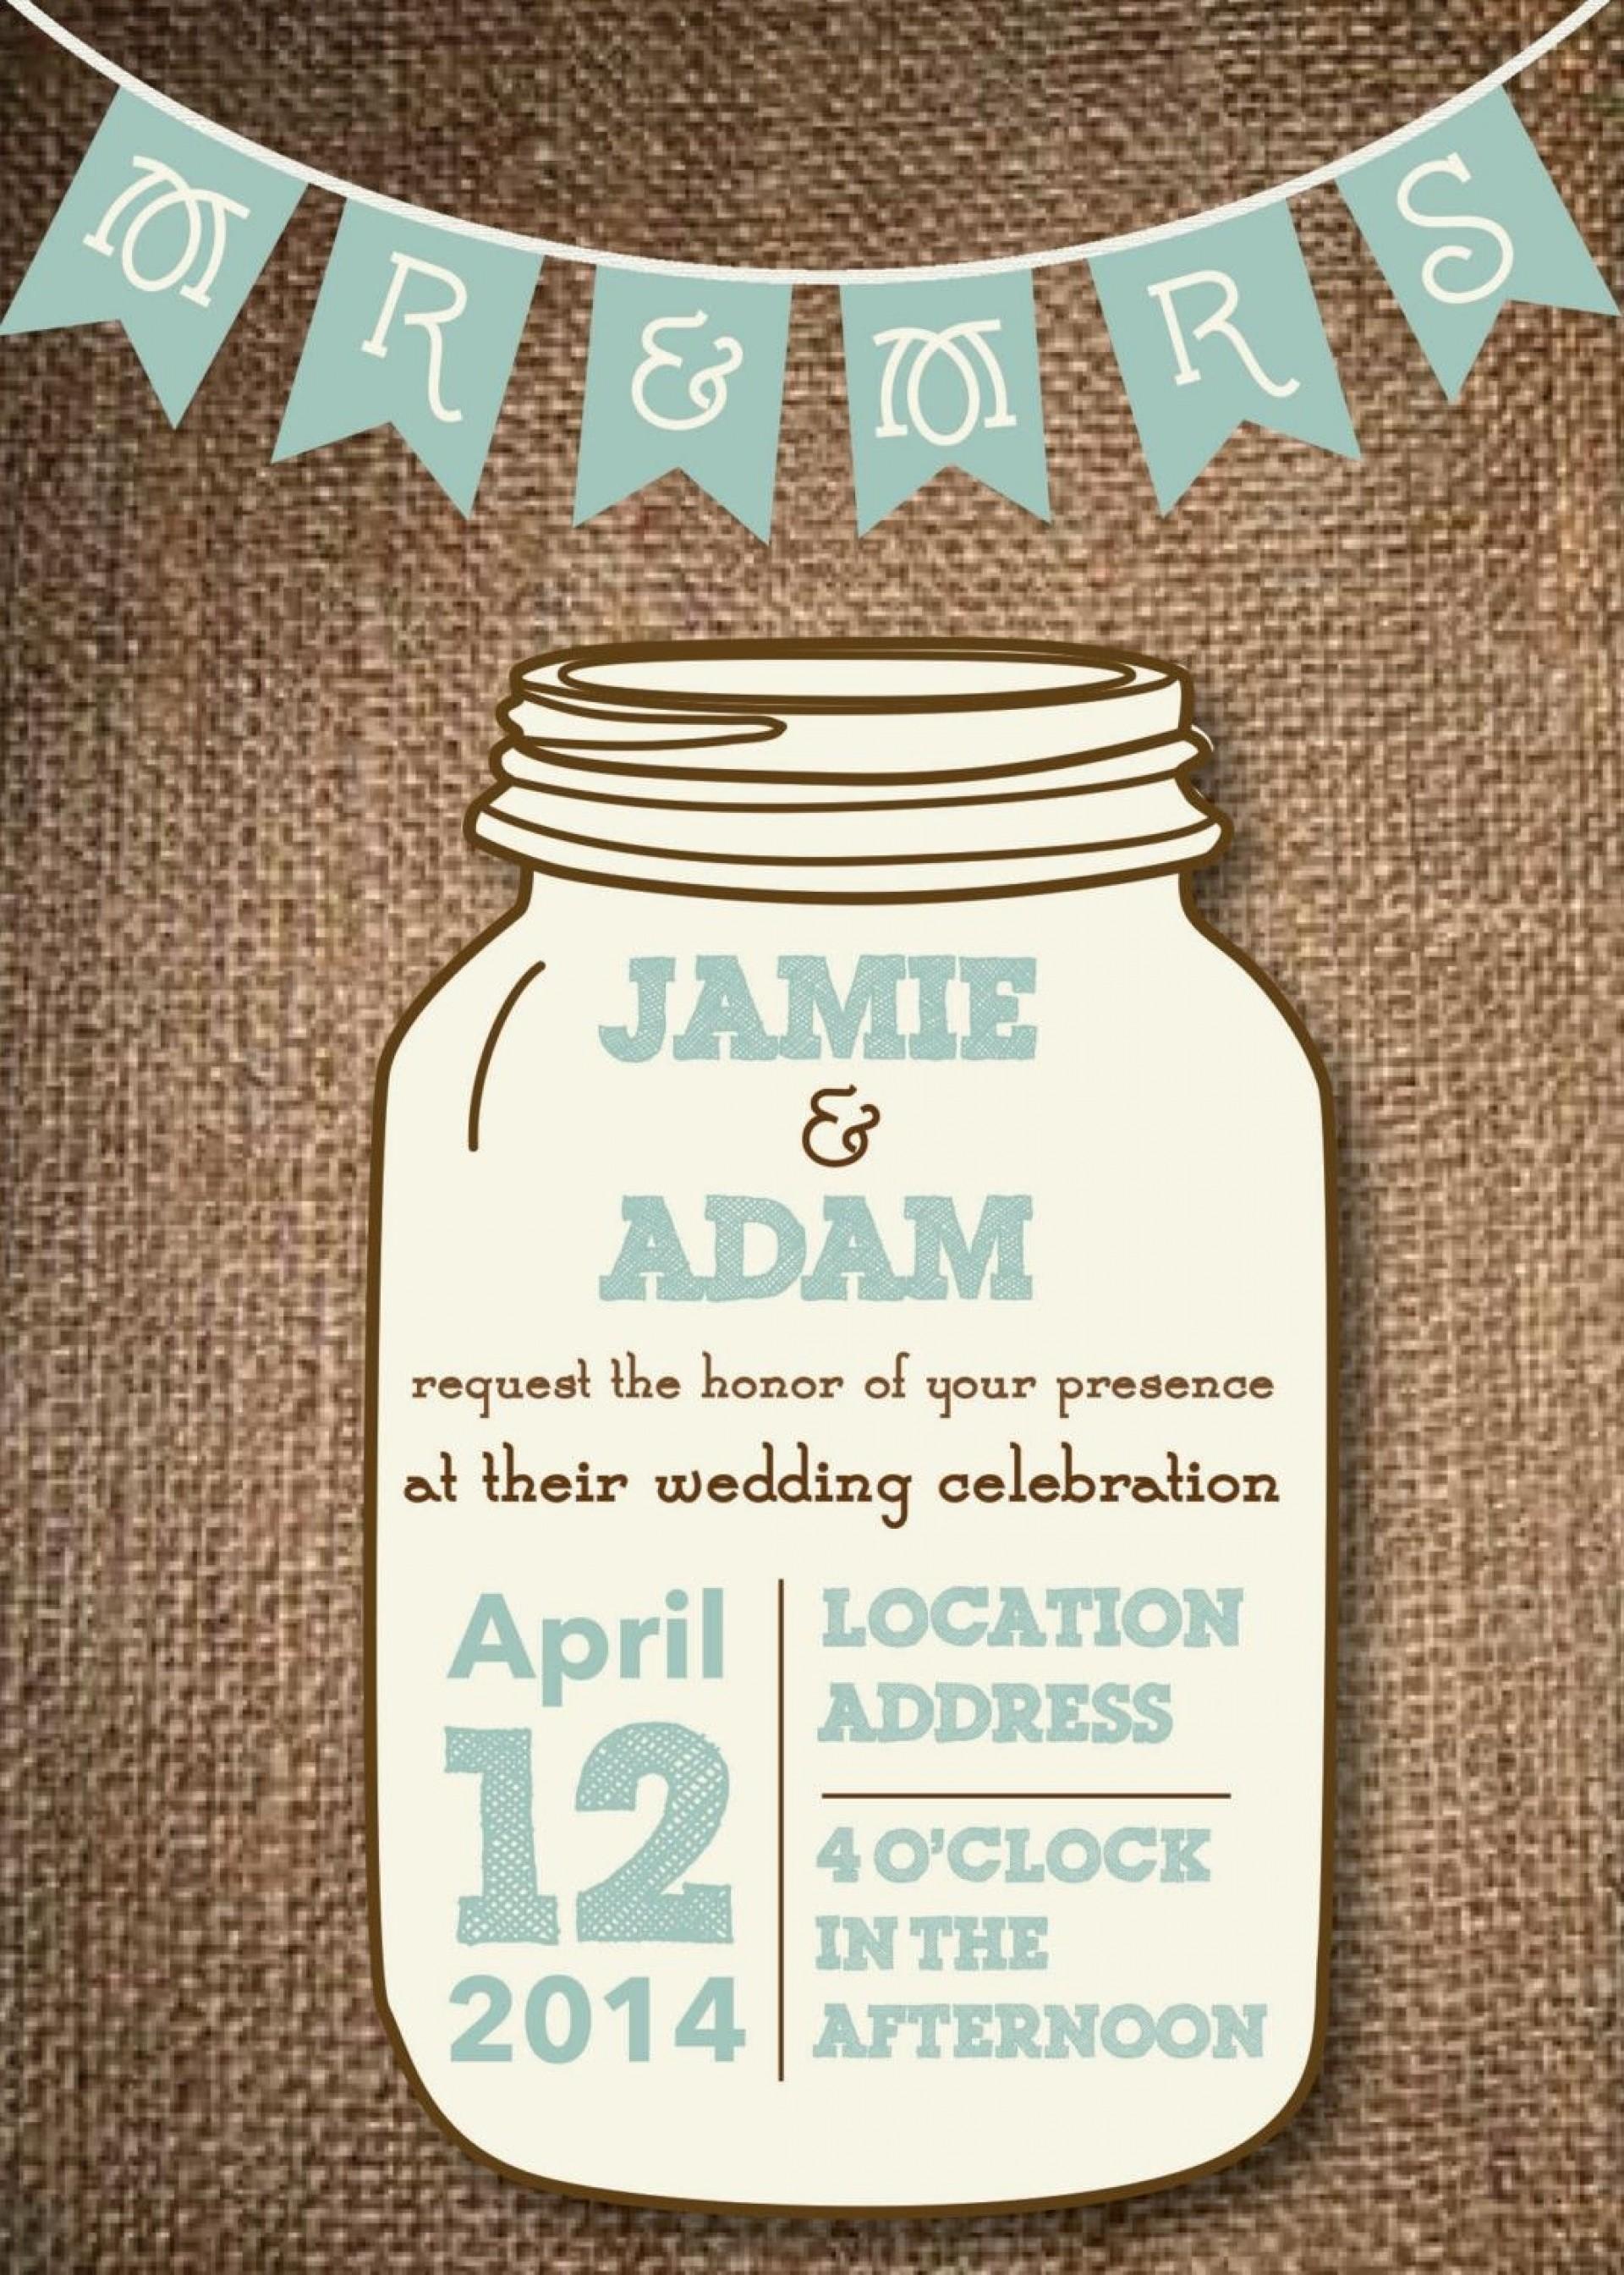 005 Surprising Mason Jar Invitation Template High Definition  Free Wedding Shower Rustic1920